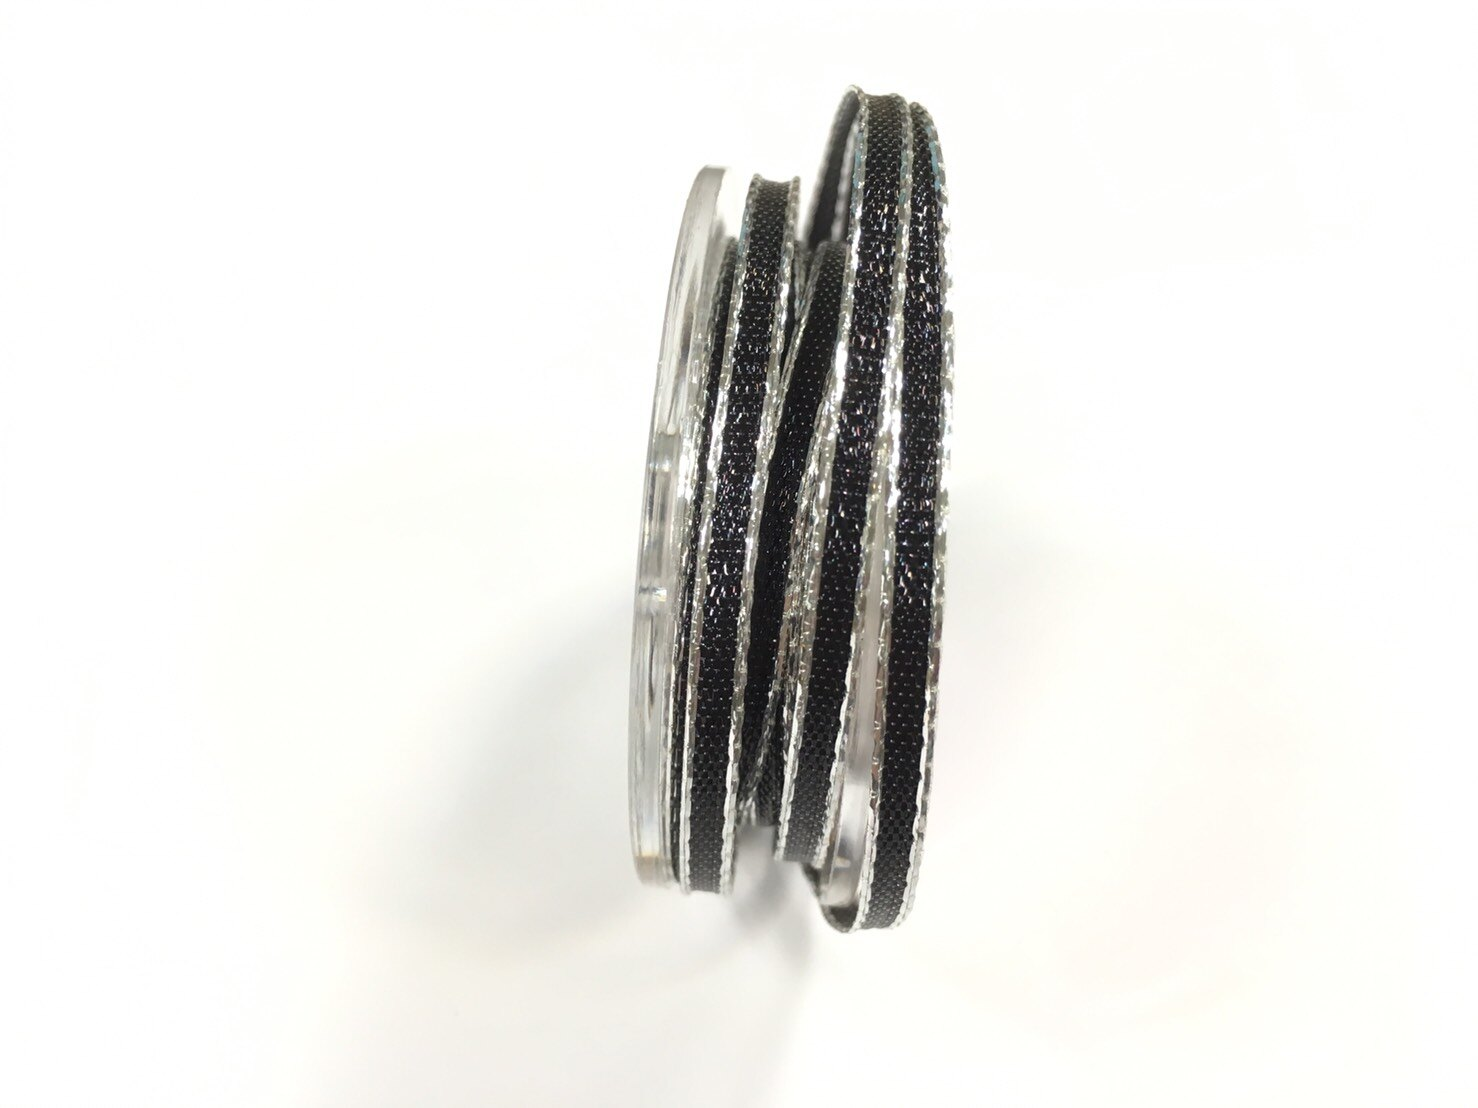 【Crystal Rose緞帶專賣店】 金屬彩邊鐵絲緞帶 3mm 3碼 (4色) 0